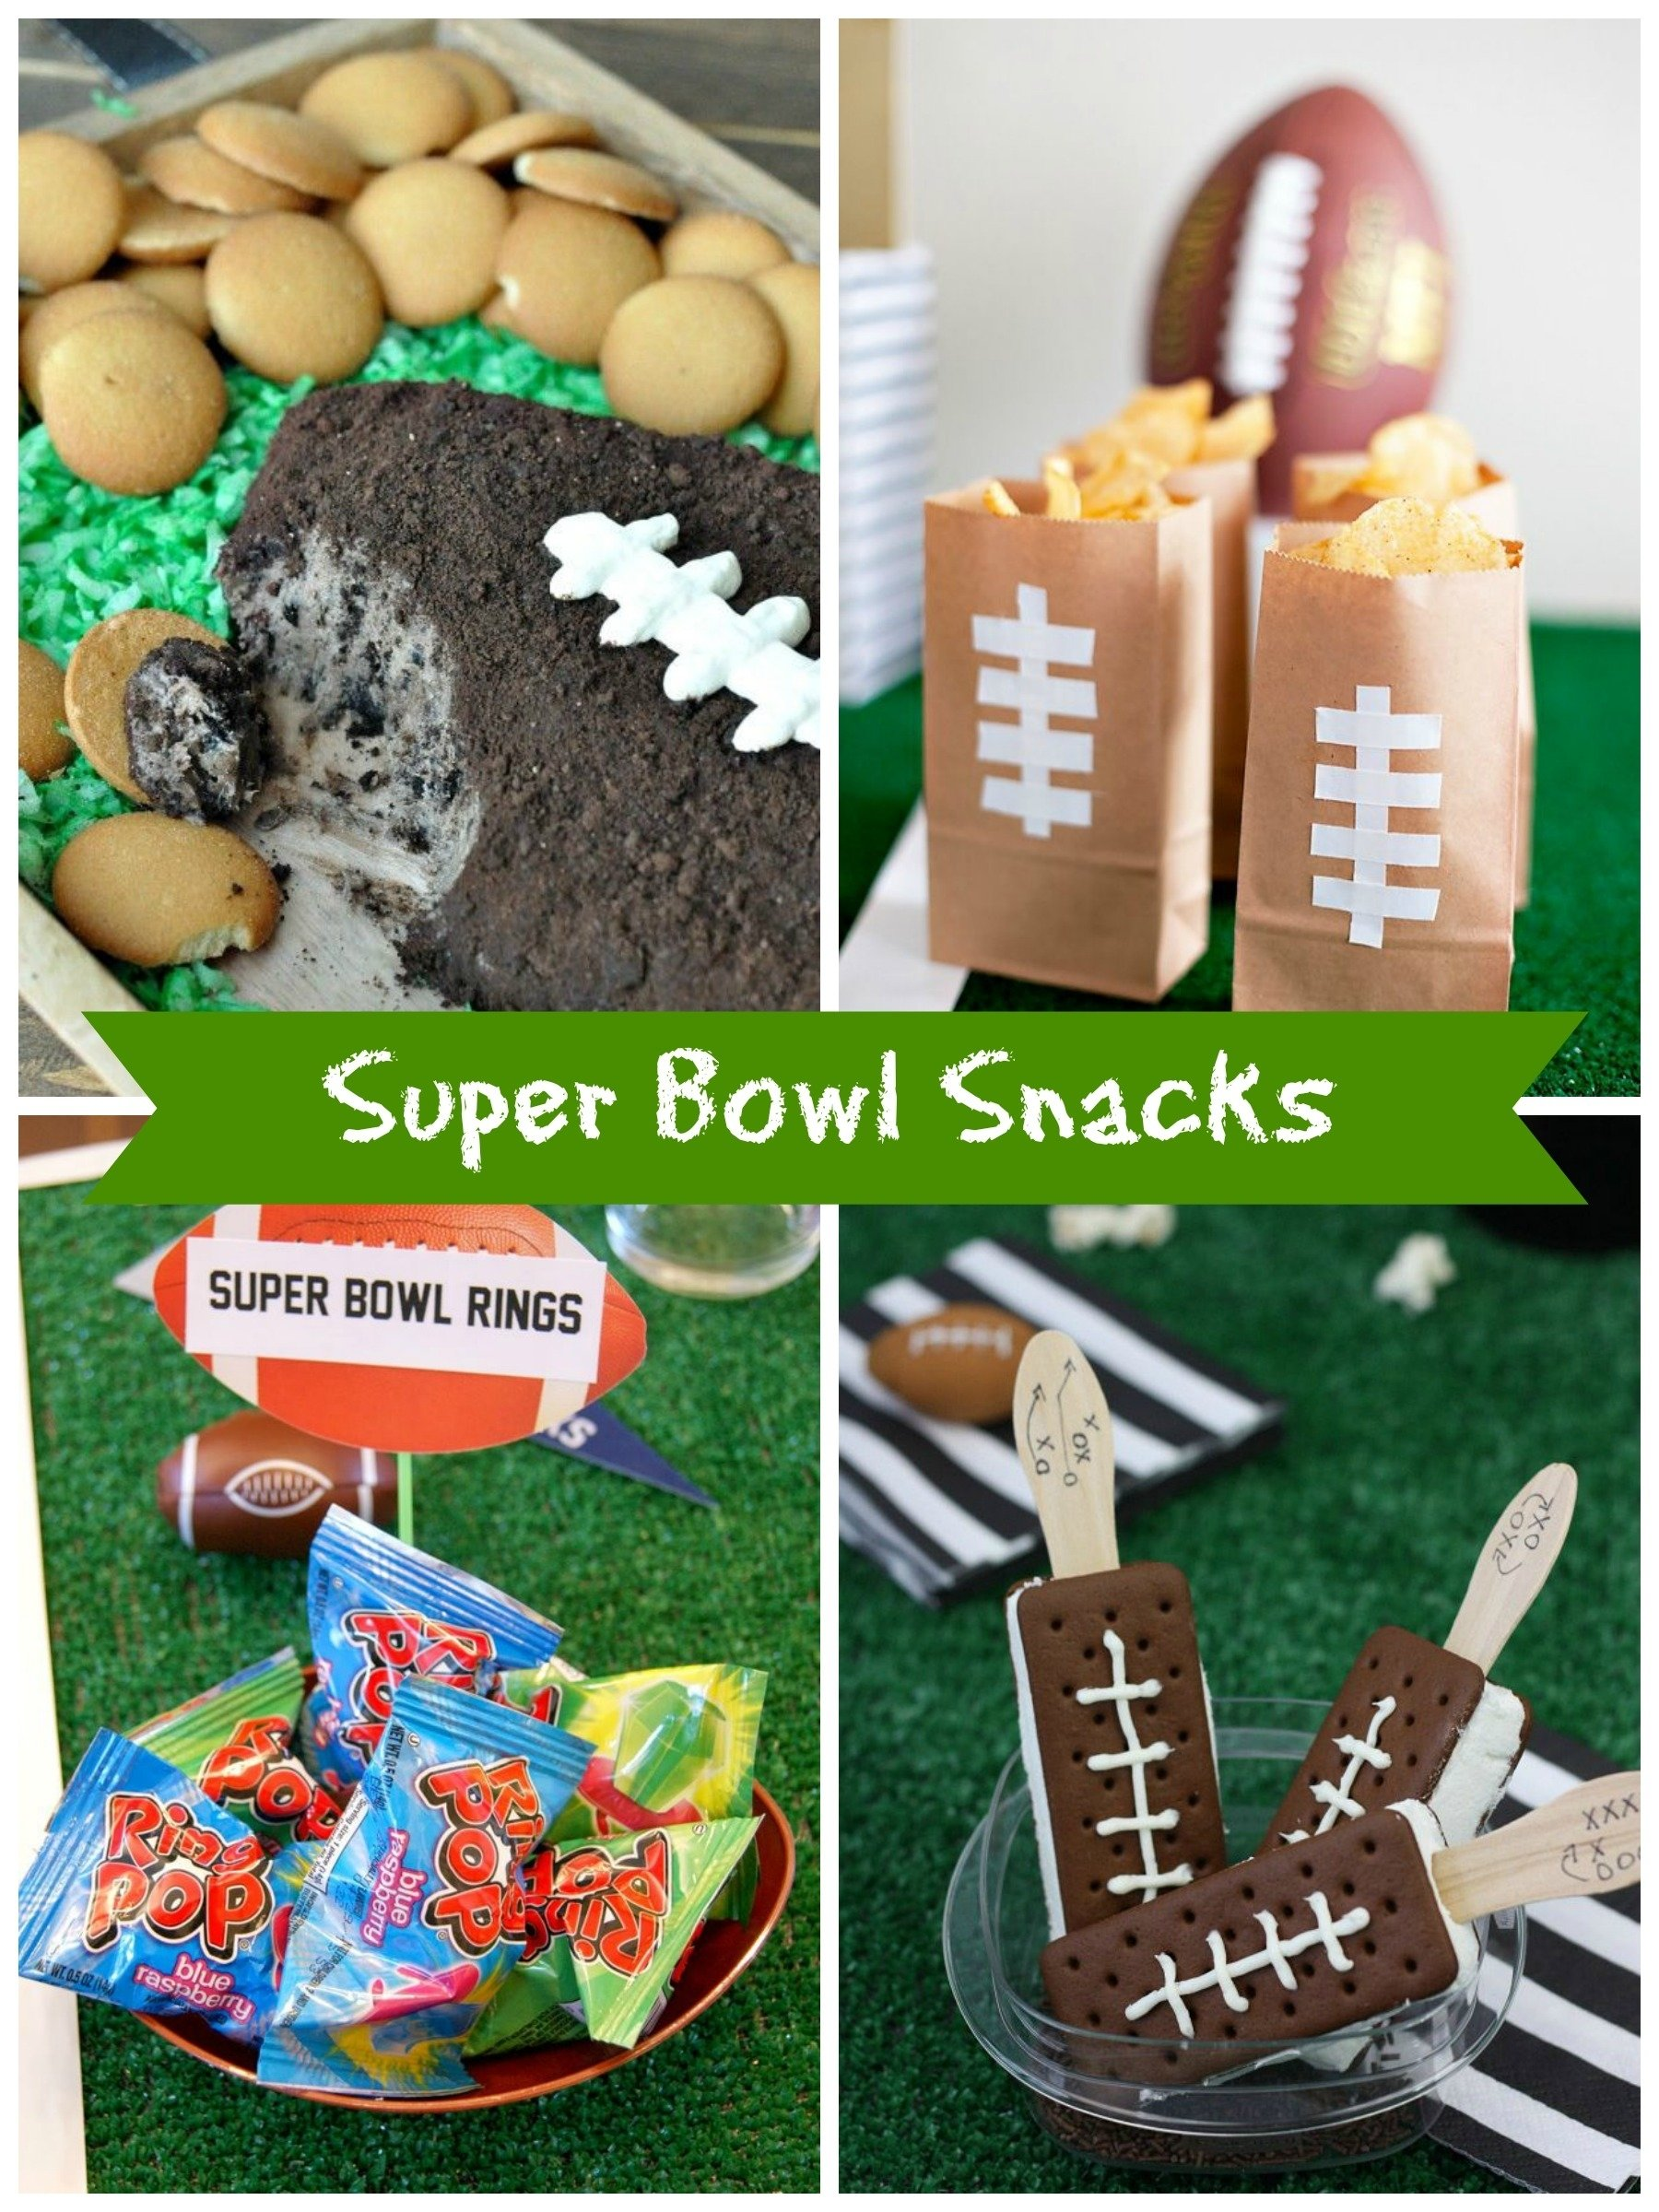 10 Amazing Super Bowl Party Decorating Ideas easy diy super bowl party ideas creative juice 7 2020